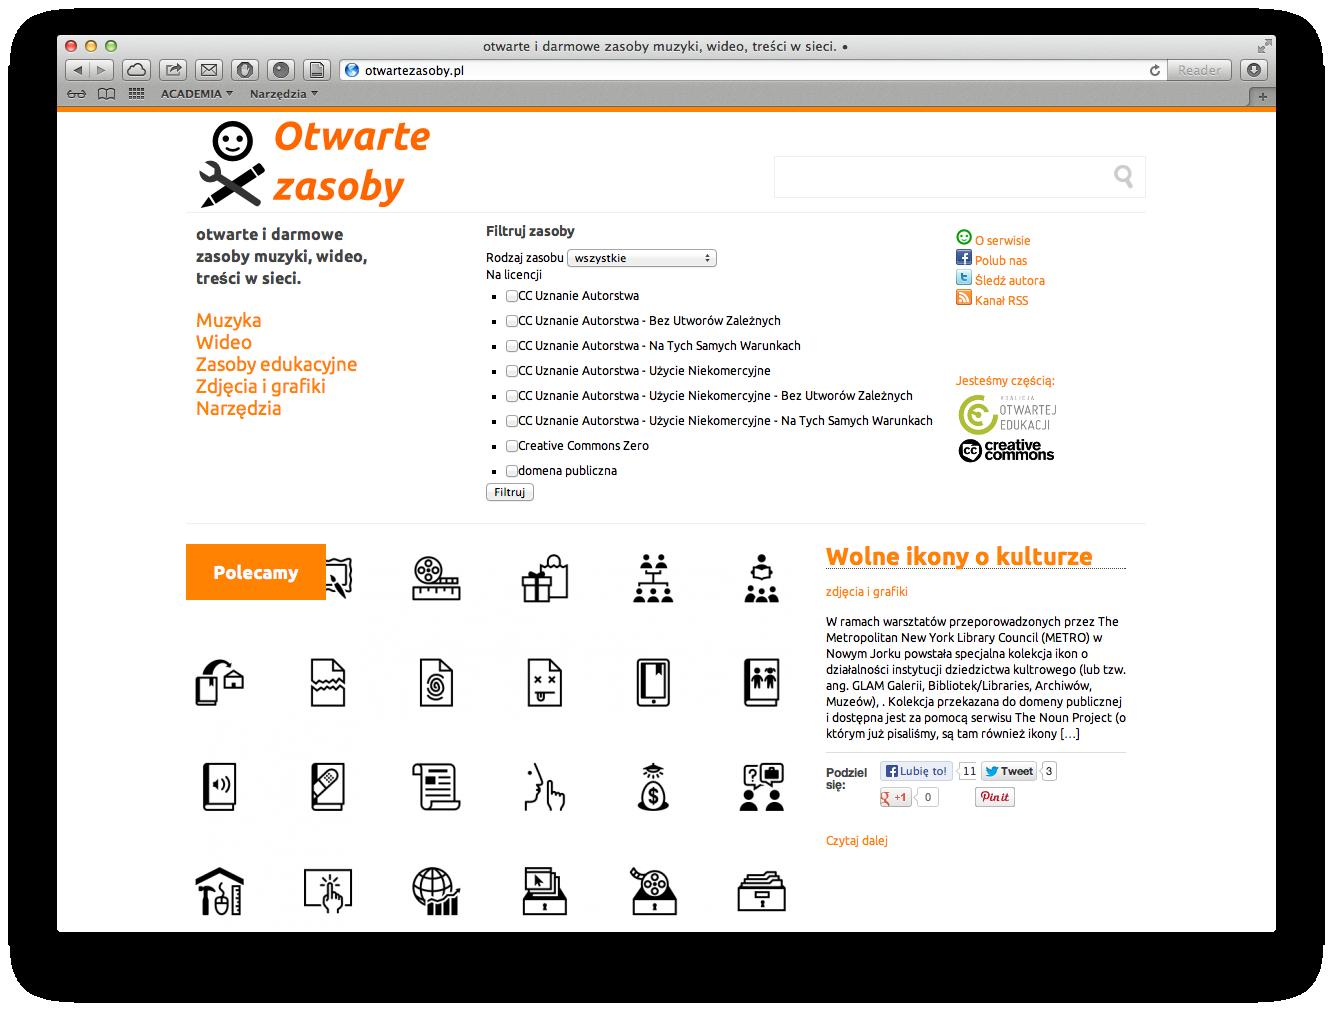 Zrzut ekranu 2013-08-29 o 13.09.10